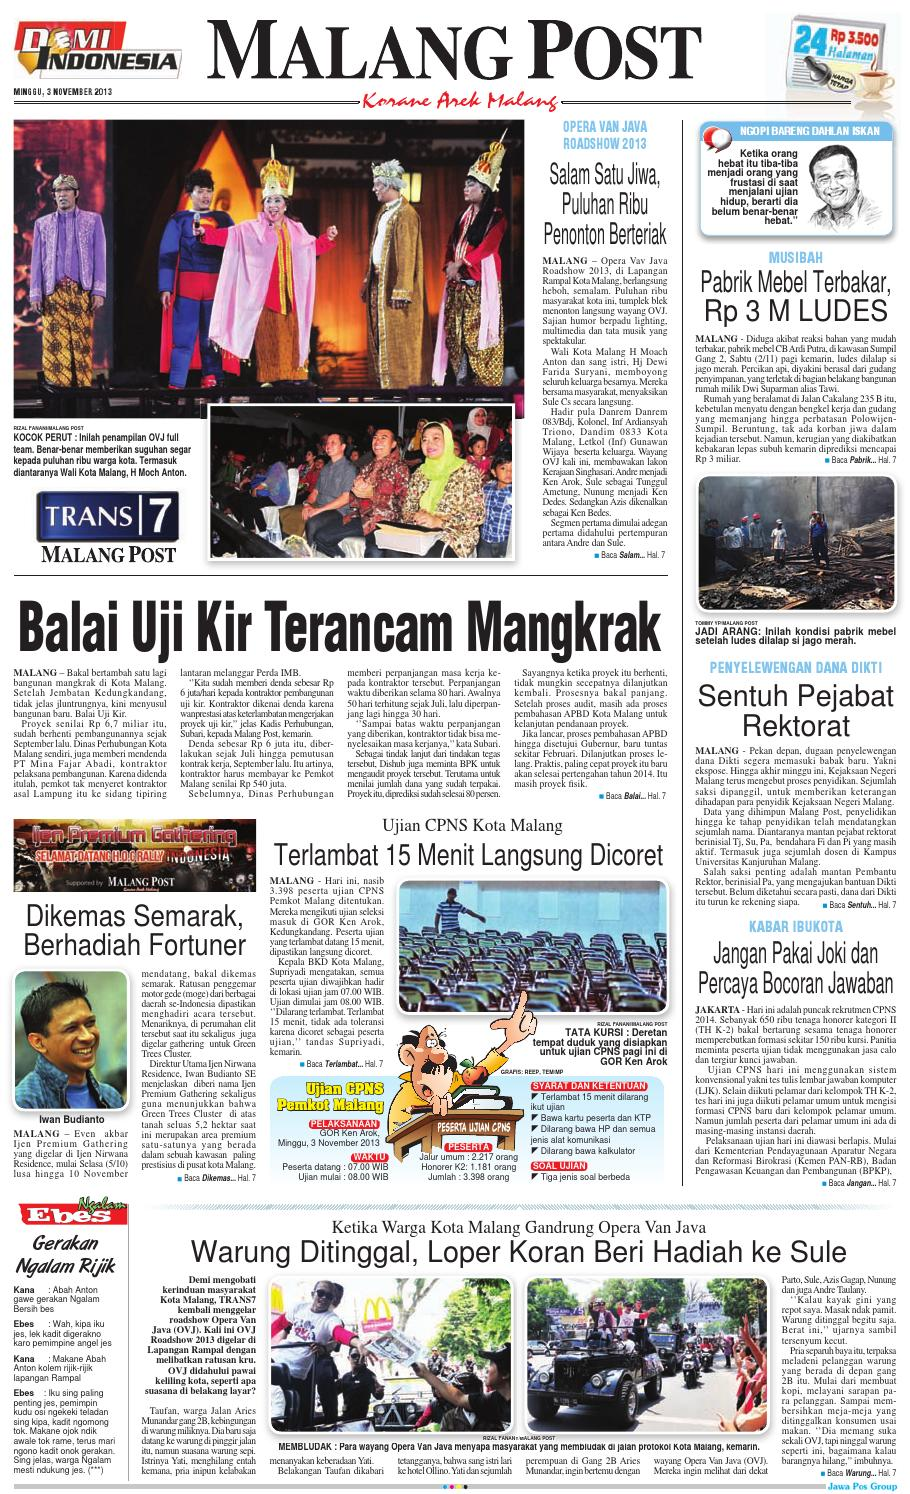 Lampung Post Minggu 30 Juli 2017 By Issuu Tas Import Anne Gratis Hijab Instan Najwa Aglrbo Mp0311